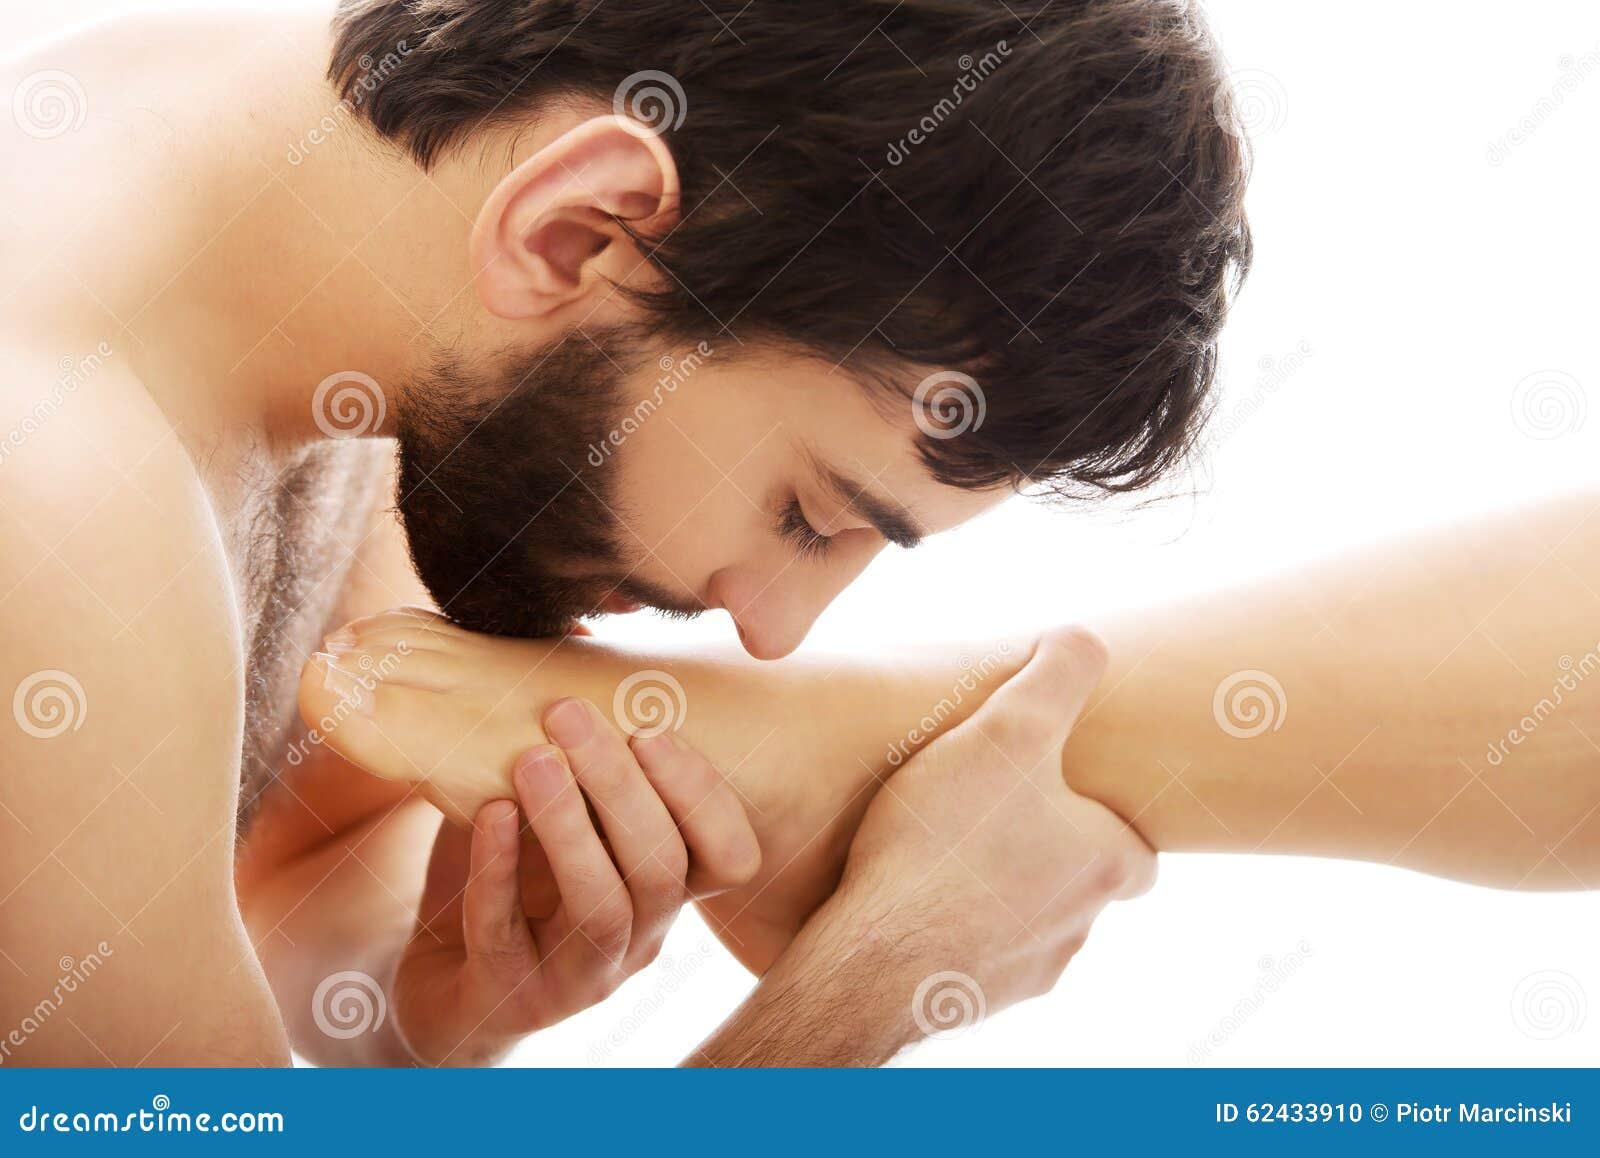 tselovat-nogi-zhenshin-korshunova-v-erotike-video